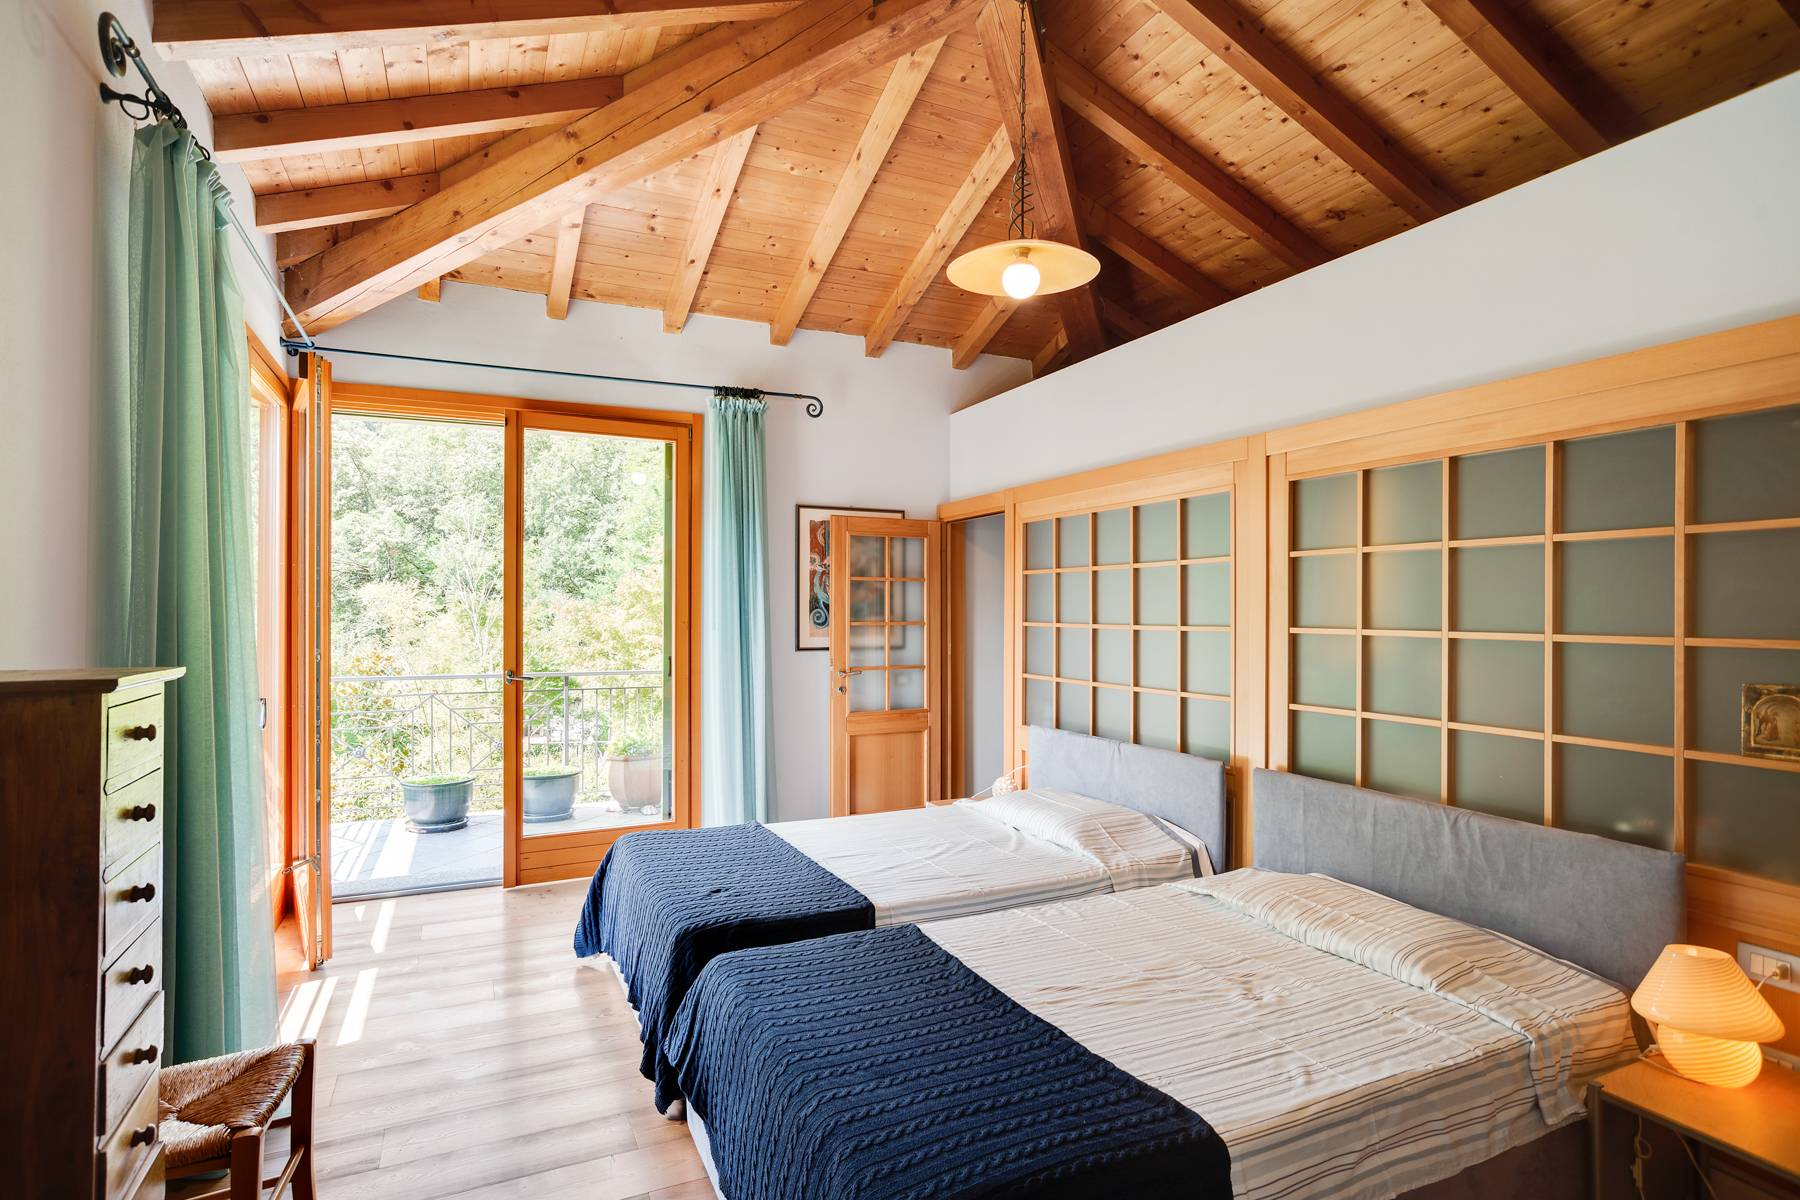 Splendida villa moderna sulla collina soleggiata sopra Argegno - 23